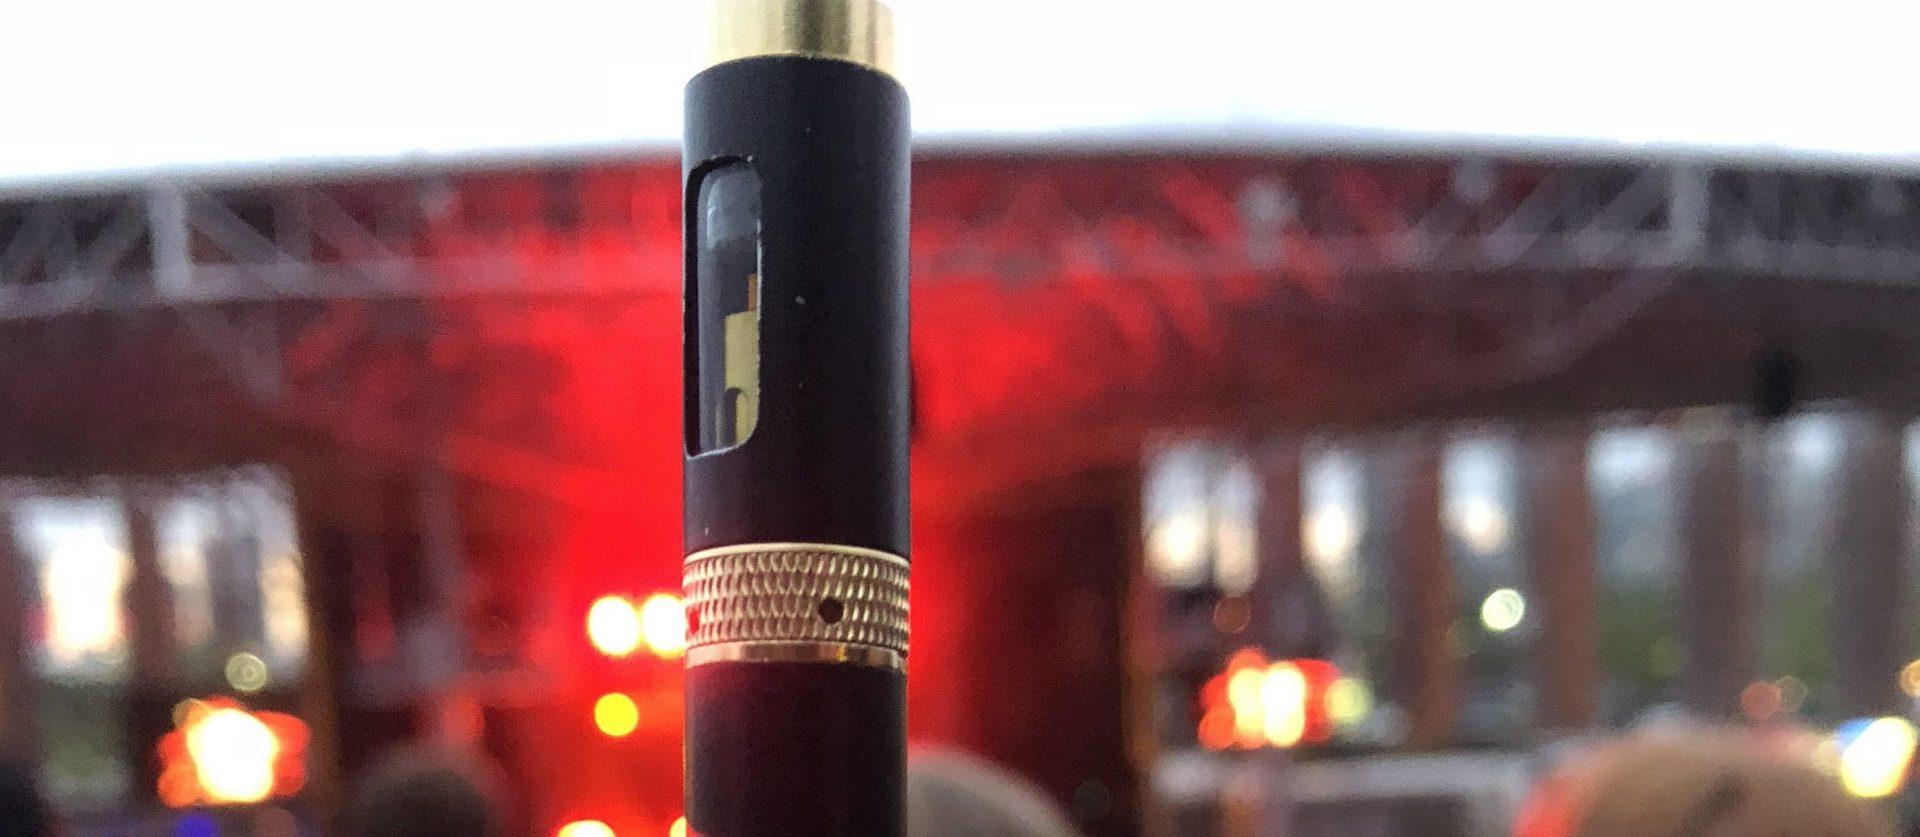 gold therapy vape pen Kendrick Lamar TDE Championship Tour